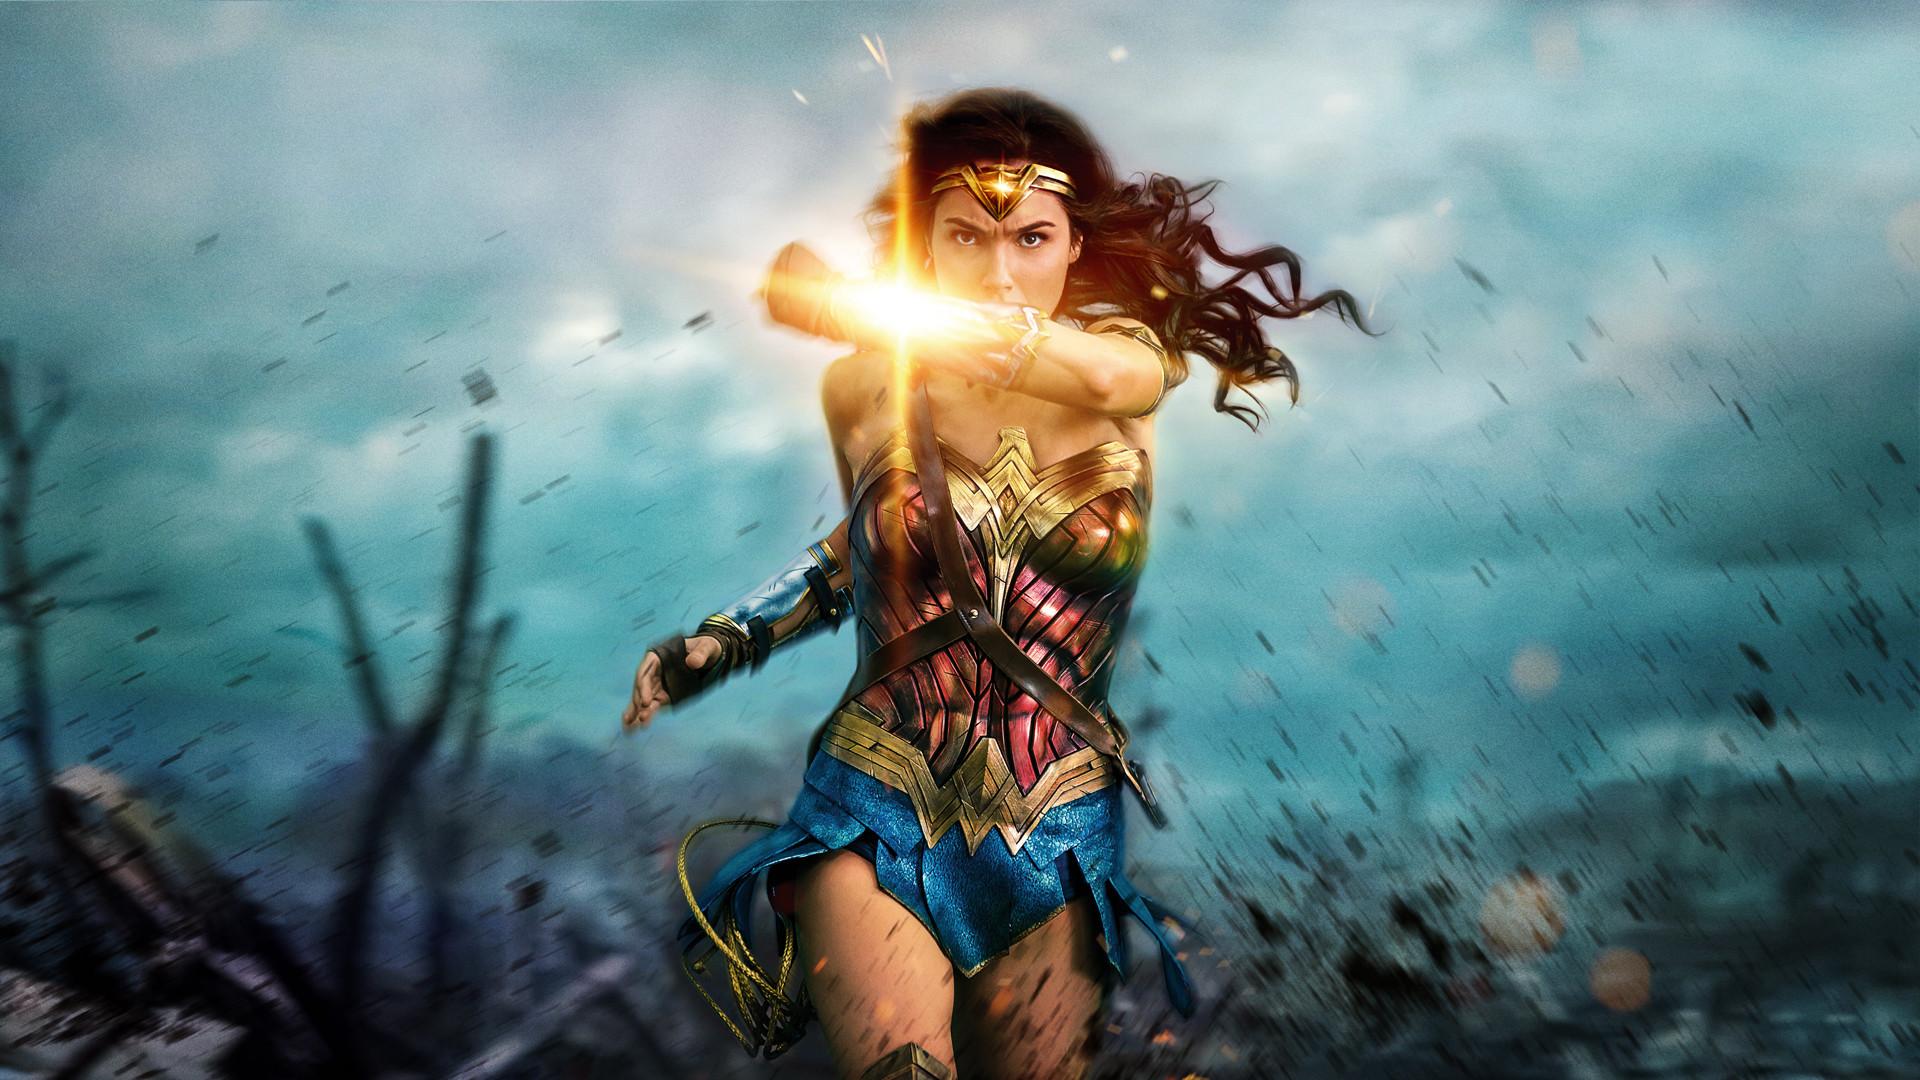 Res: 1920x1080, Wonder Woman Wallpaper  by sachso74 Wonder Woman Wallpaper   by sachso74